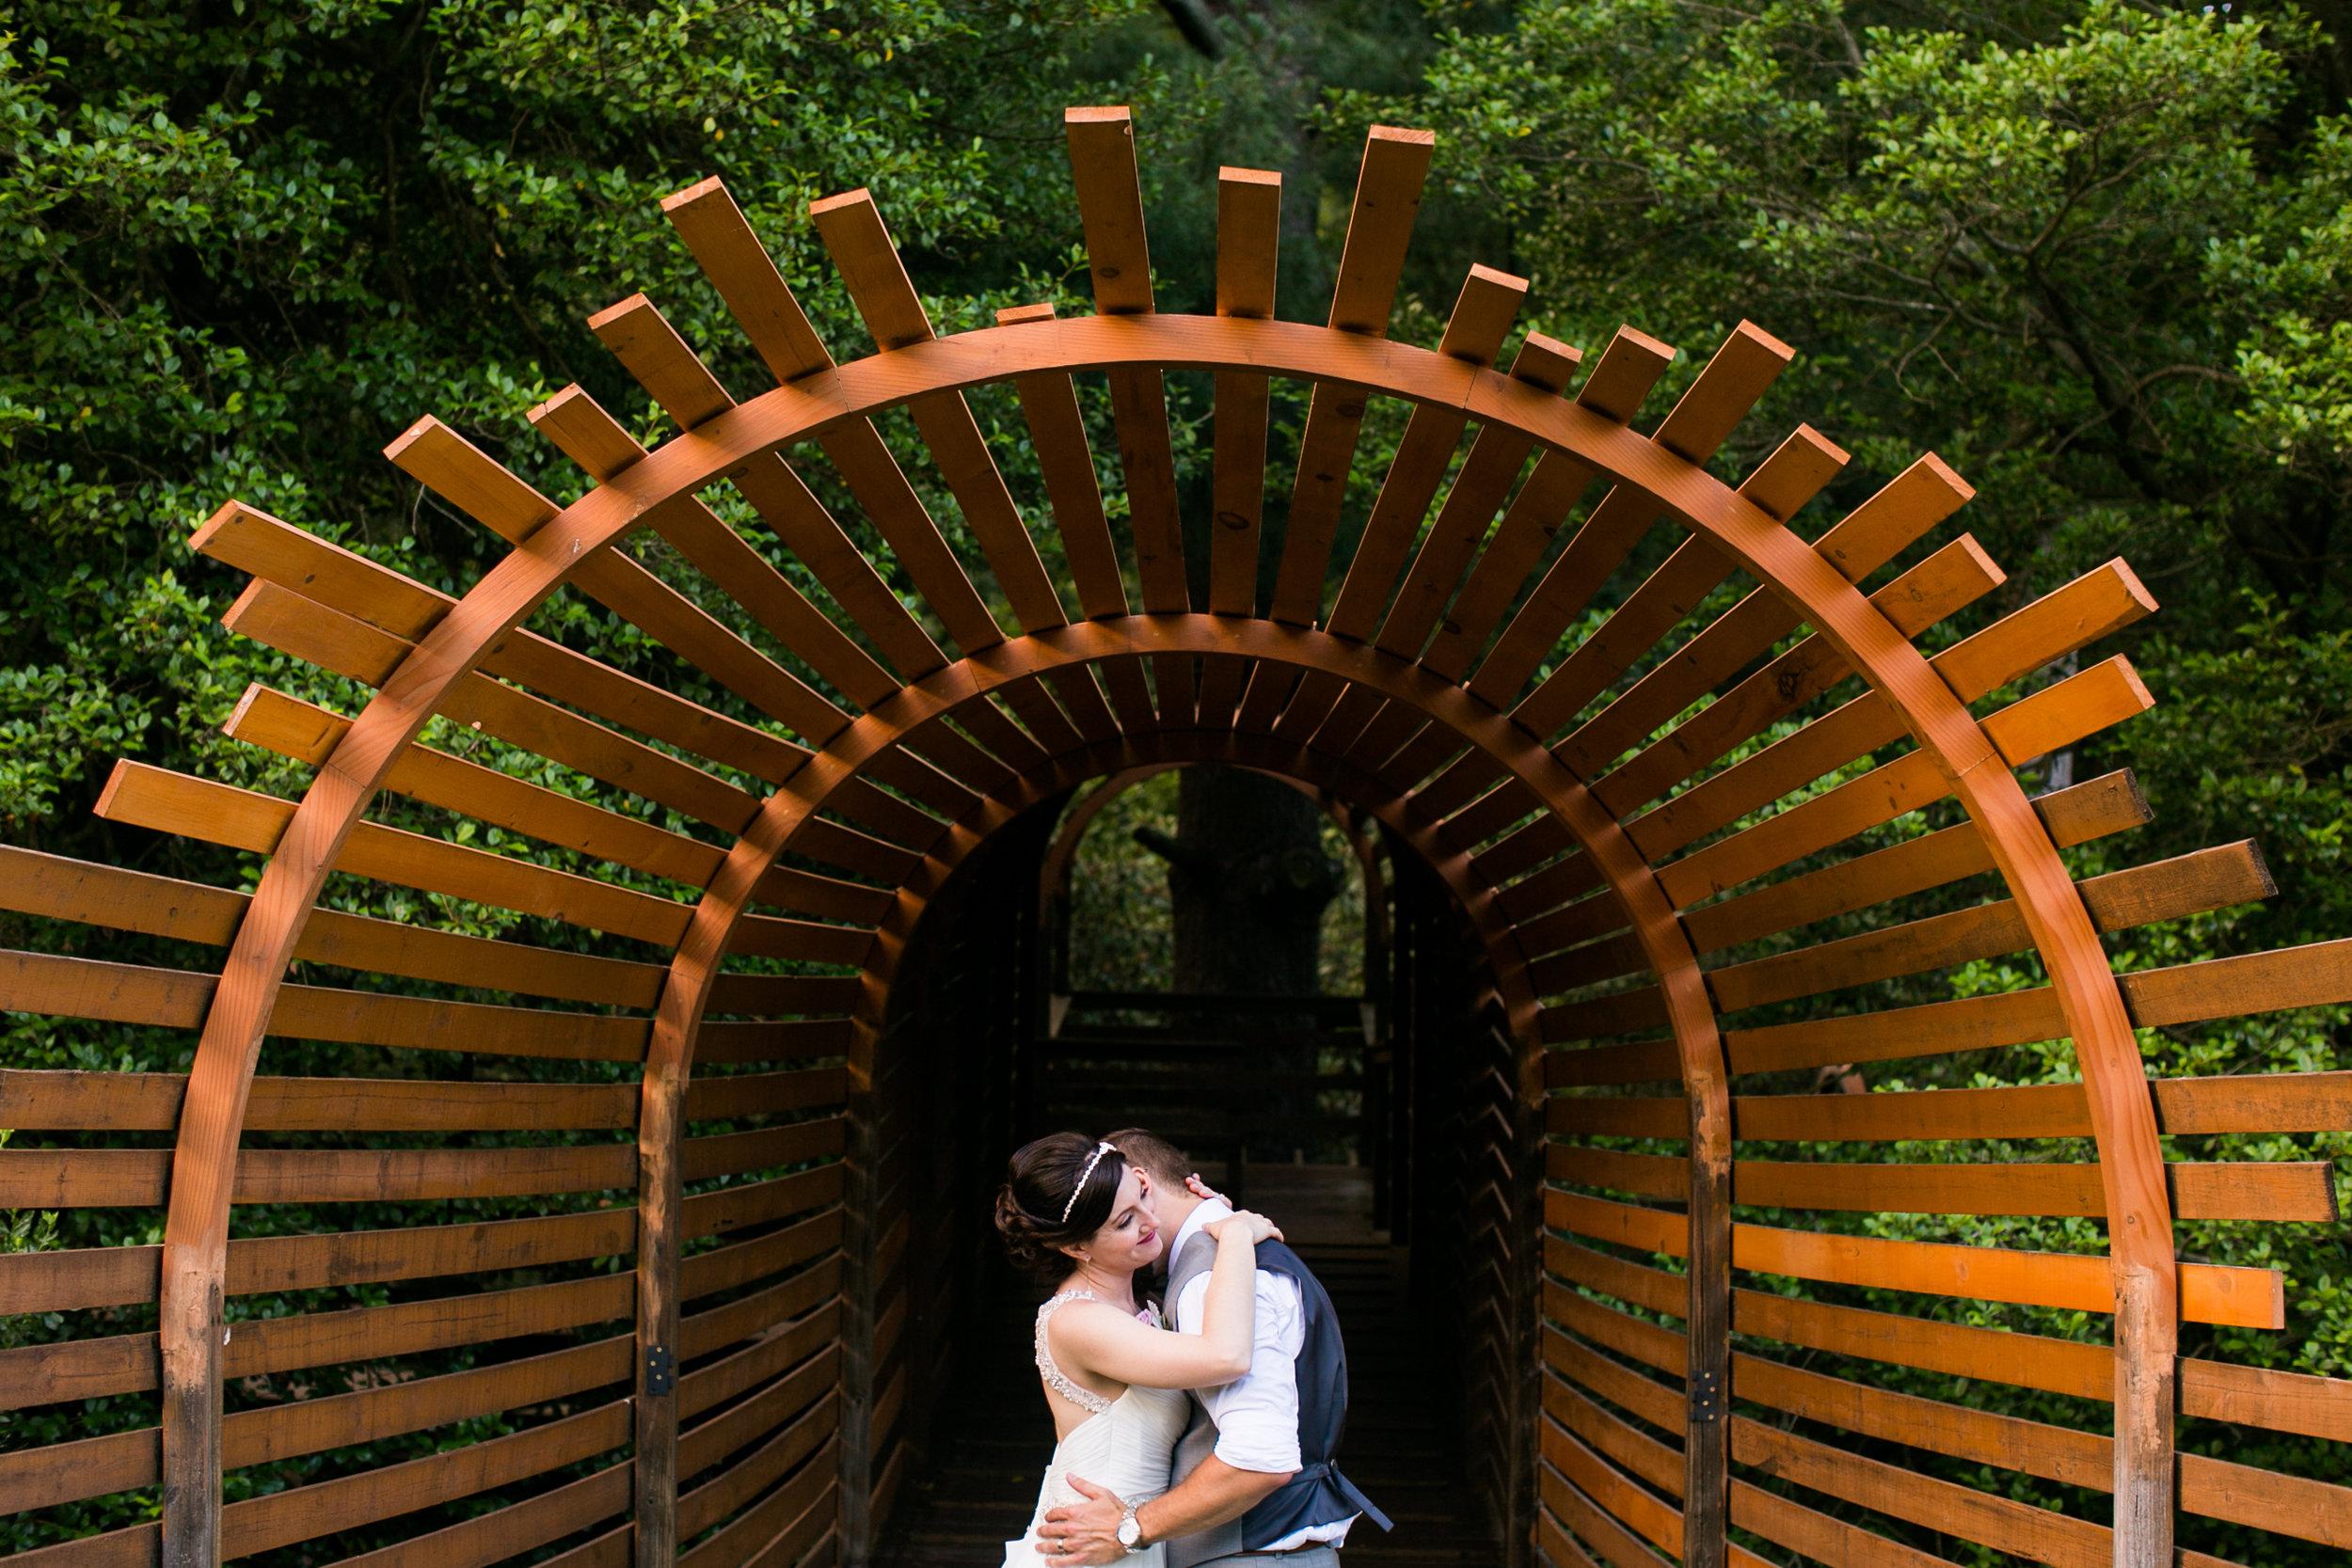 TYLER ARBORETUM WEDDING PHOTOGRAPHY LOVESTRUCK PICTURES-070.jpg